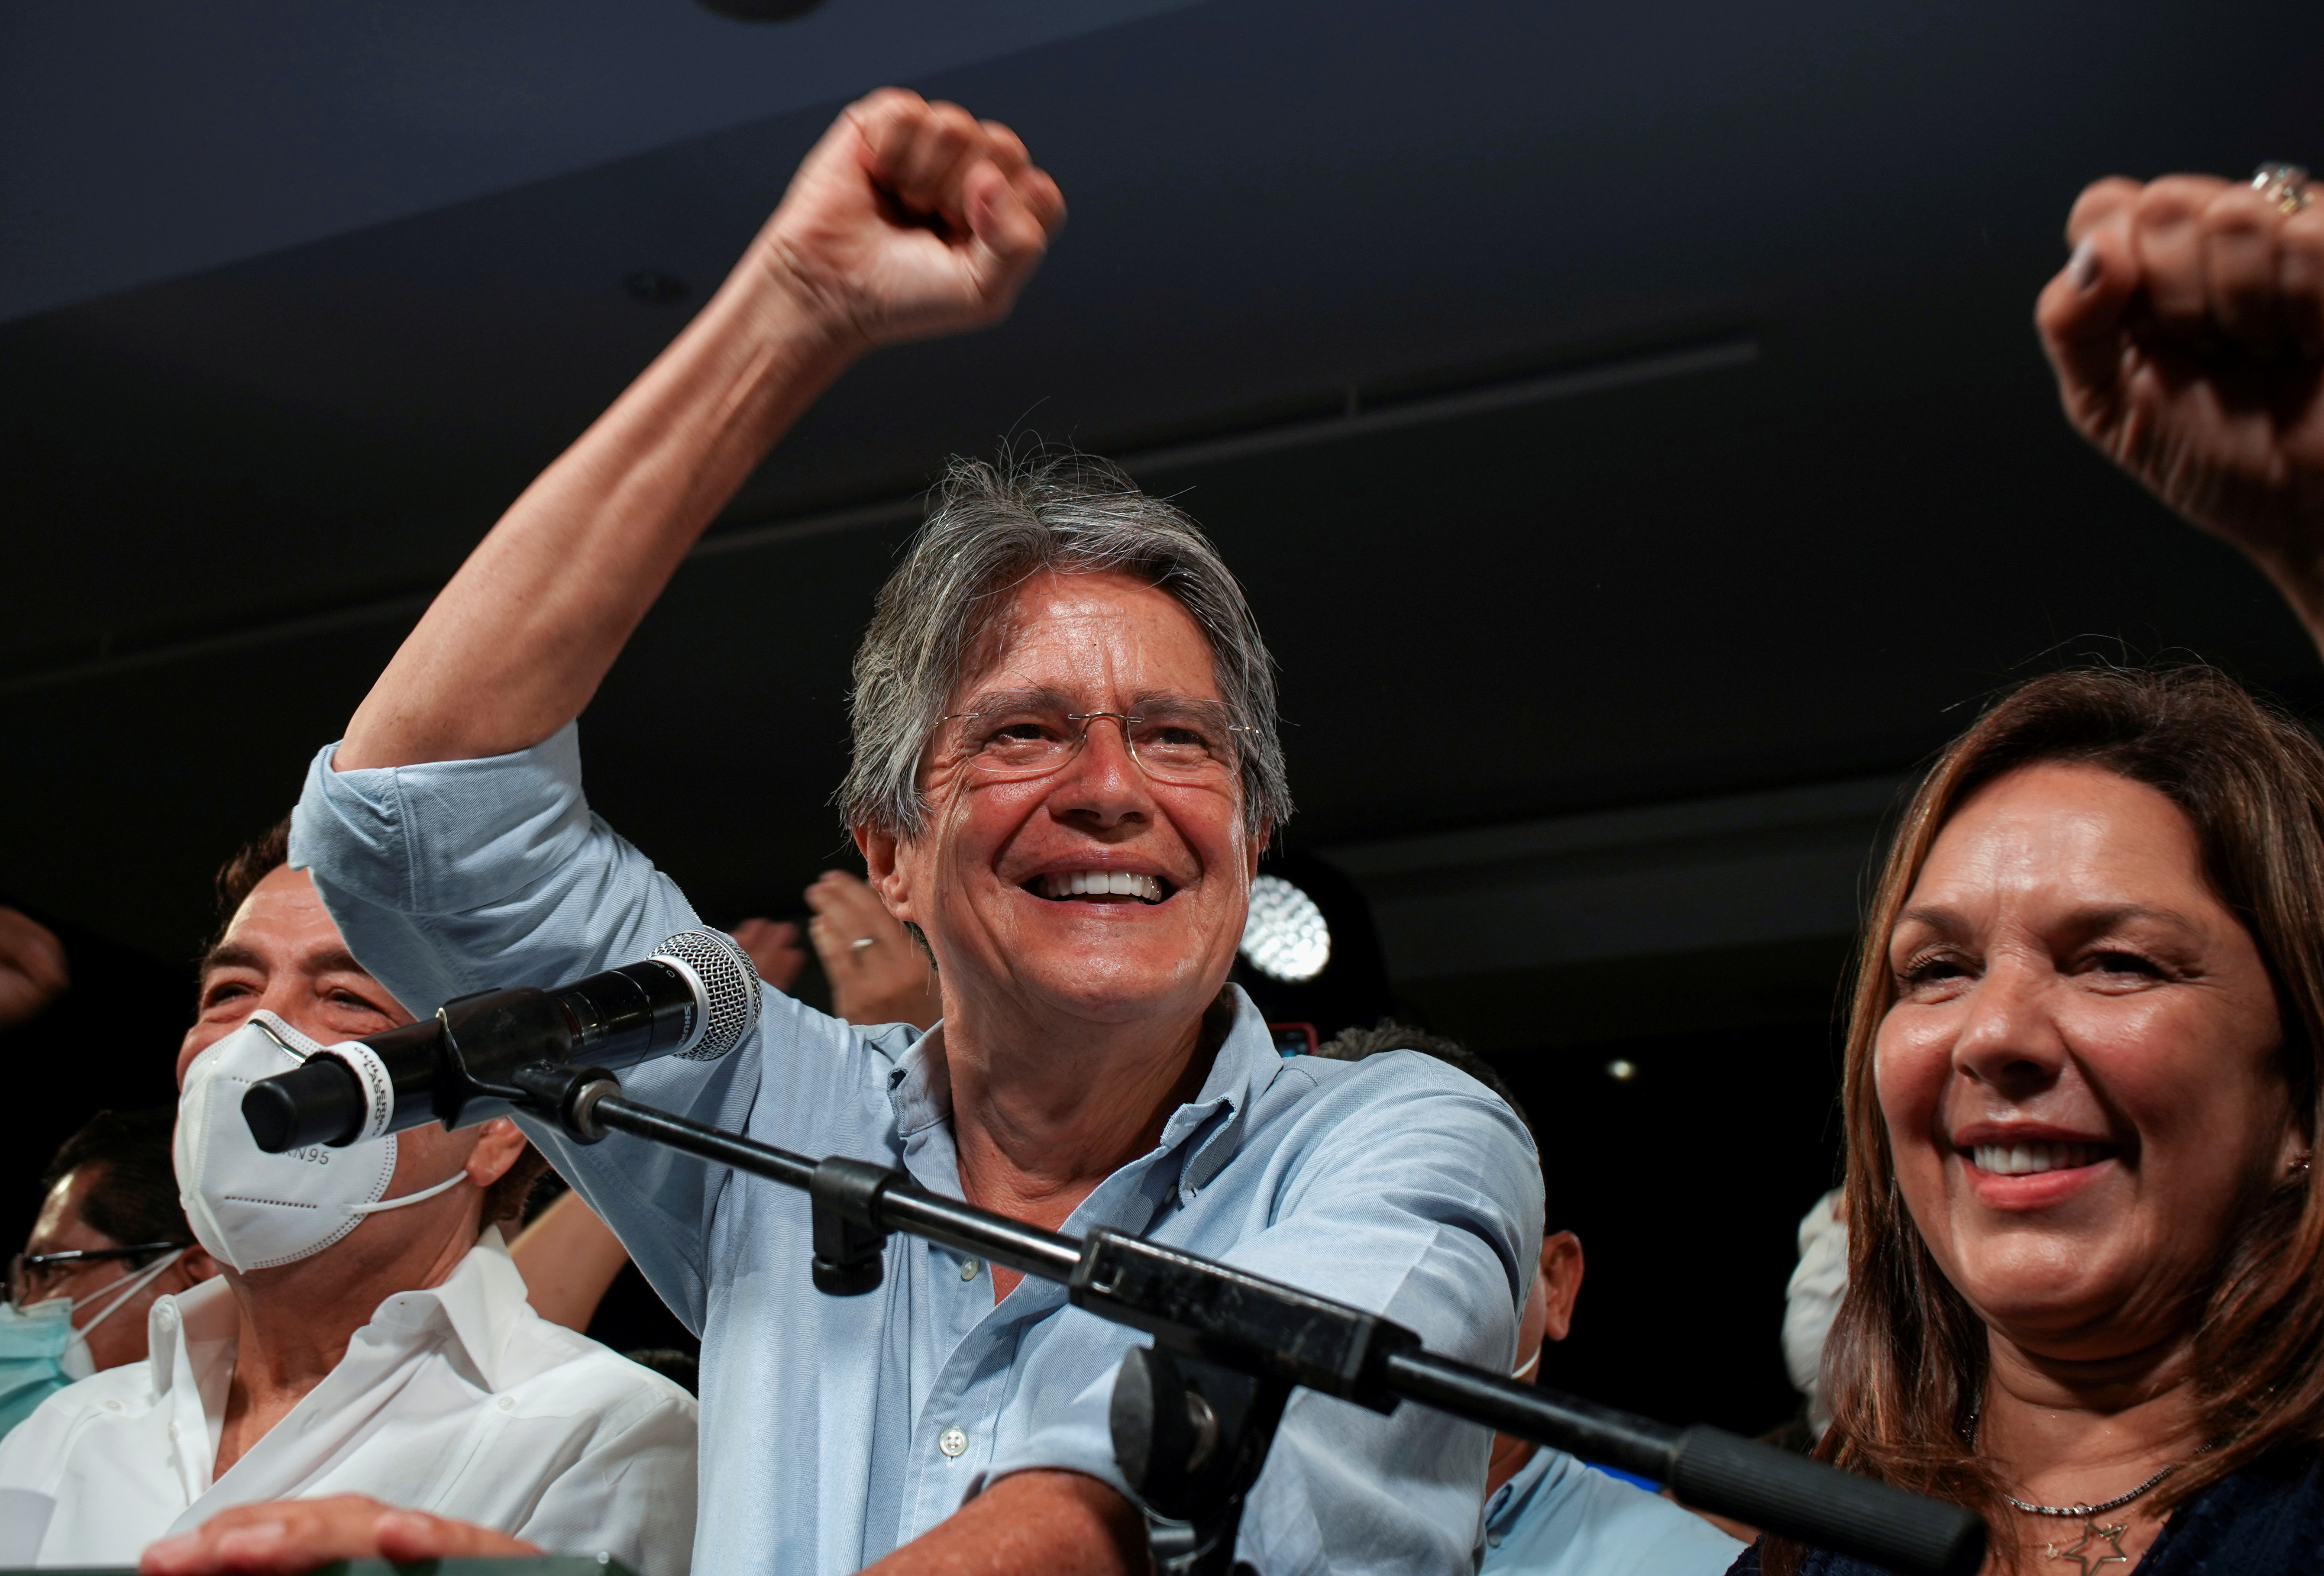 Ecuadorean banker Guillermo Lasso and his wife Maria de Lourdes Alcivar react after Lasso wins the presidential runoff vote, in Guayaquil, Ecuador April 11, 2021. REUTERS/Maria Fernanda Landin